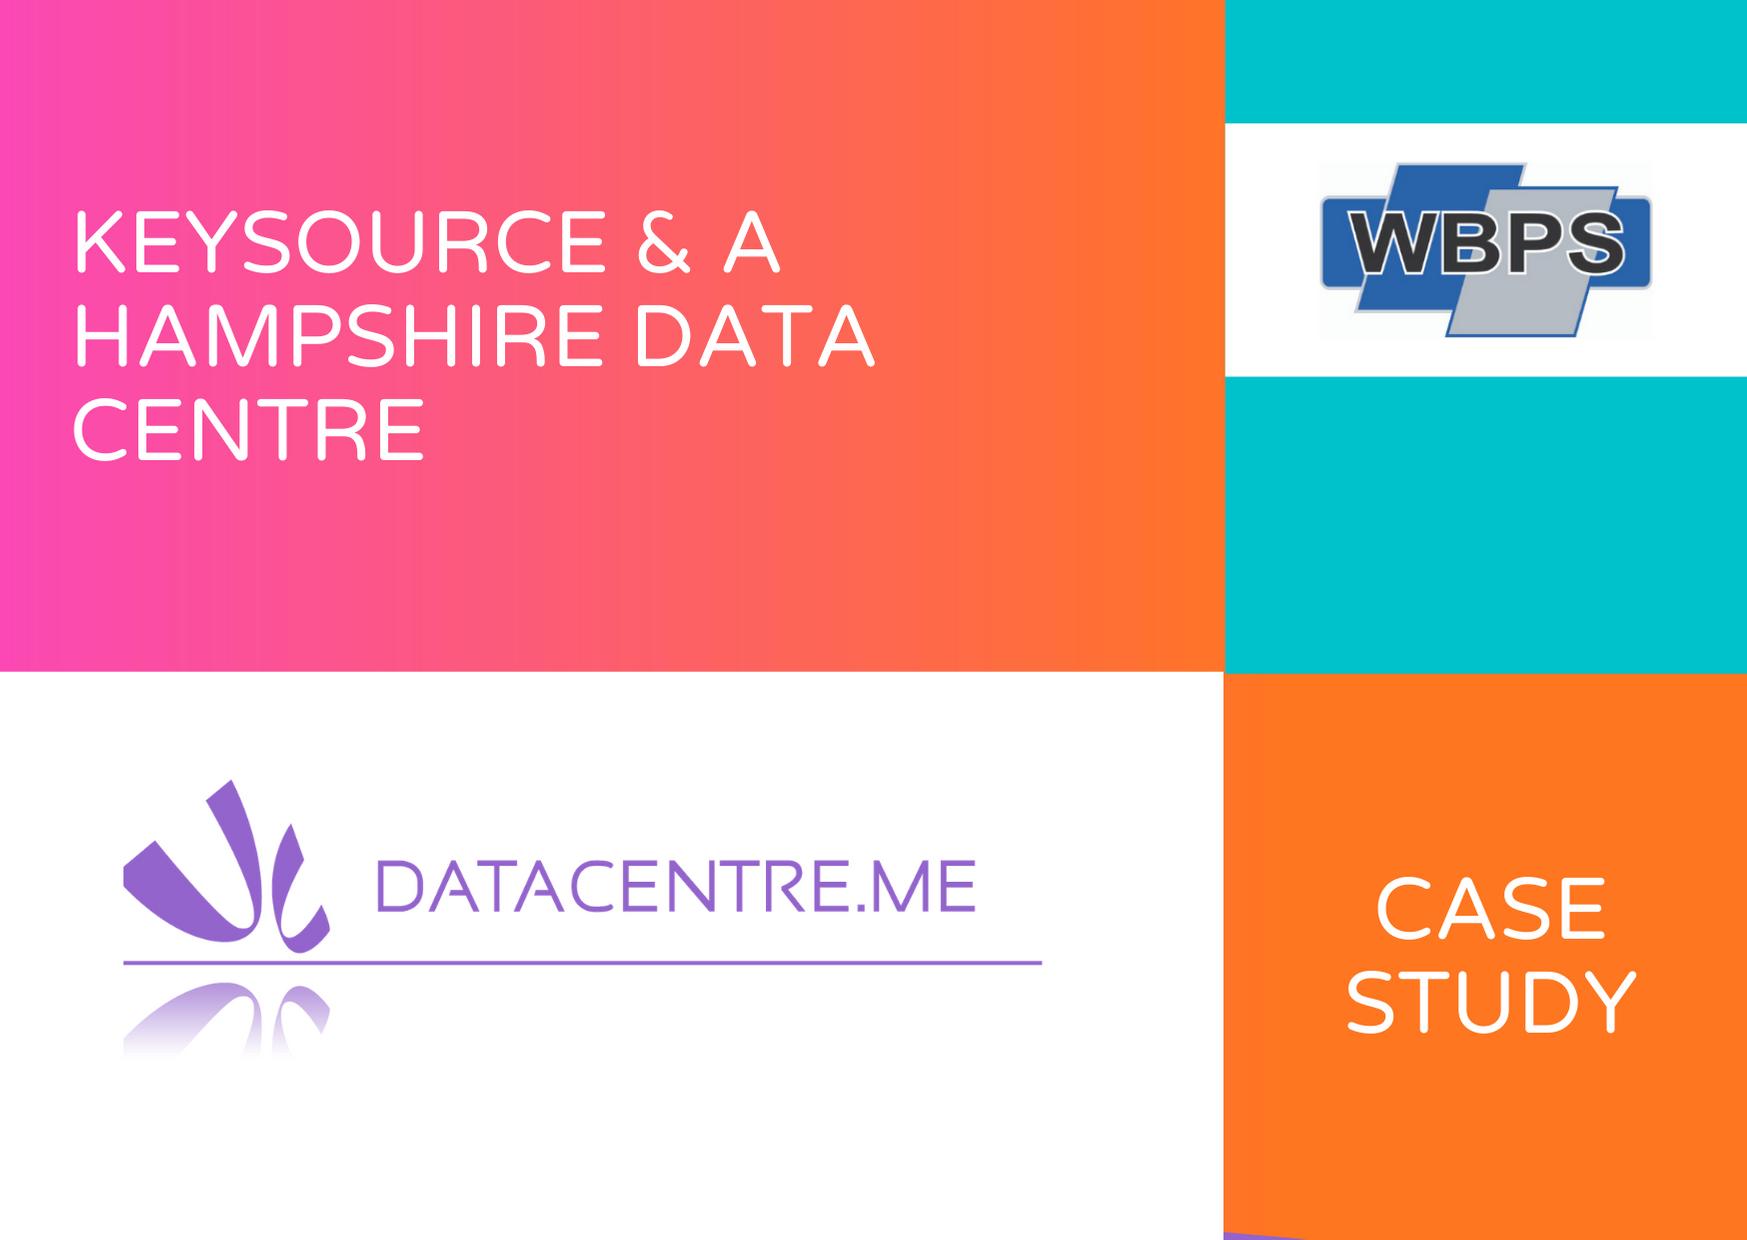 Keysource & A Hampshire Data Centre - a WBPS Case Study